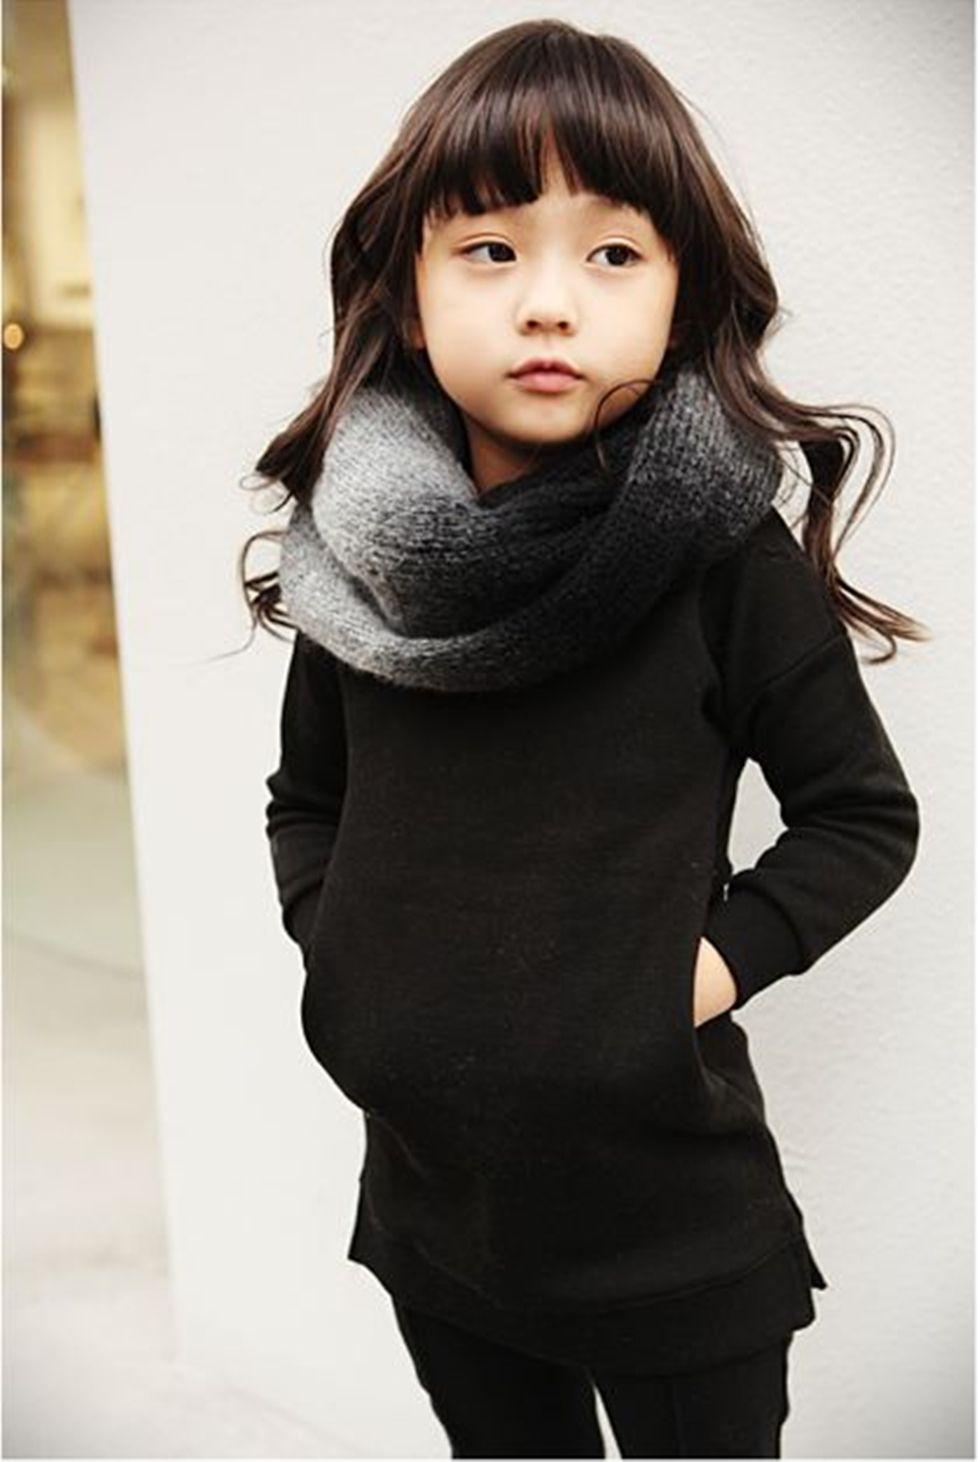 kid's scarf